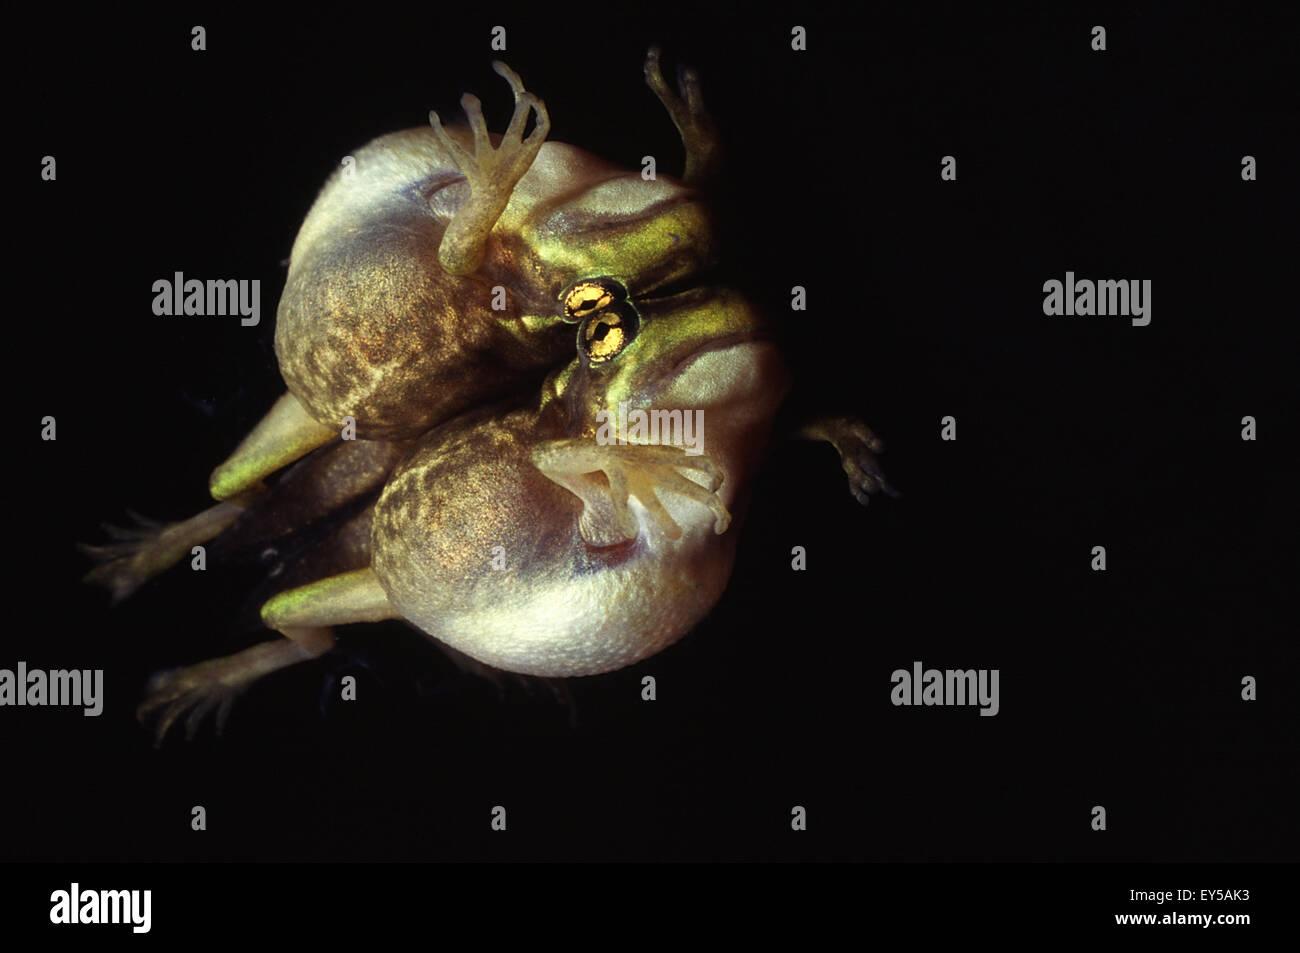 Golden bell frog reflexion- New Zealand - Stock Image